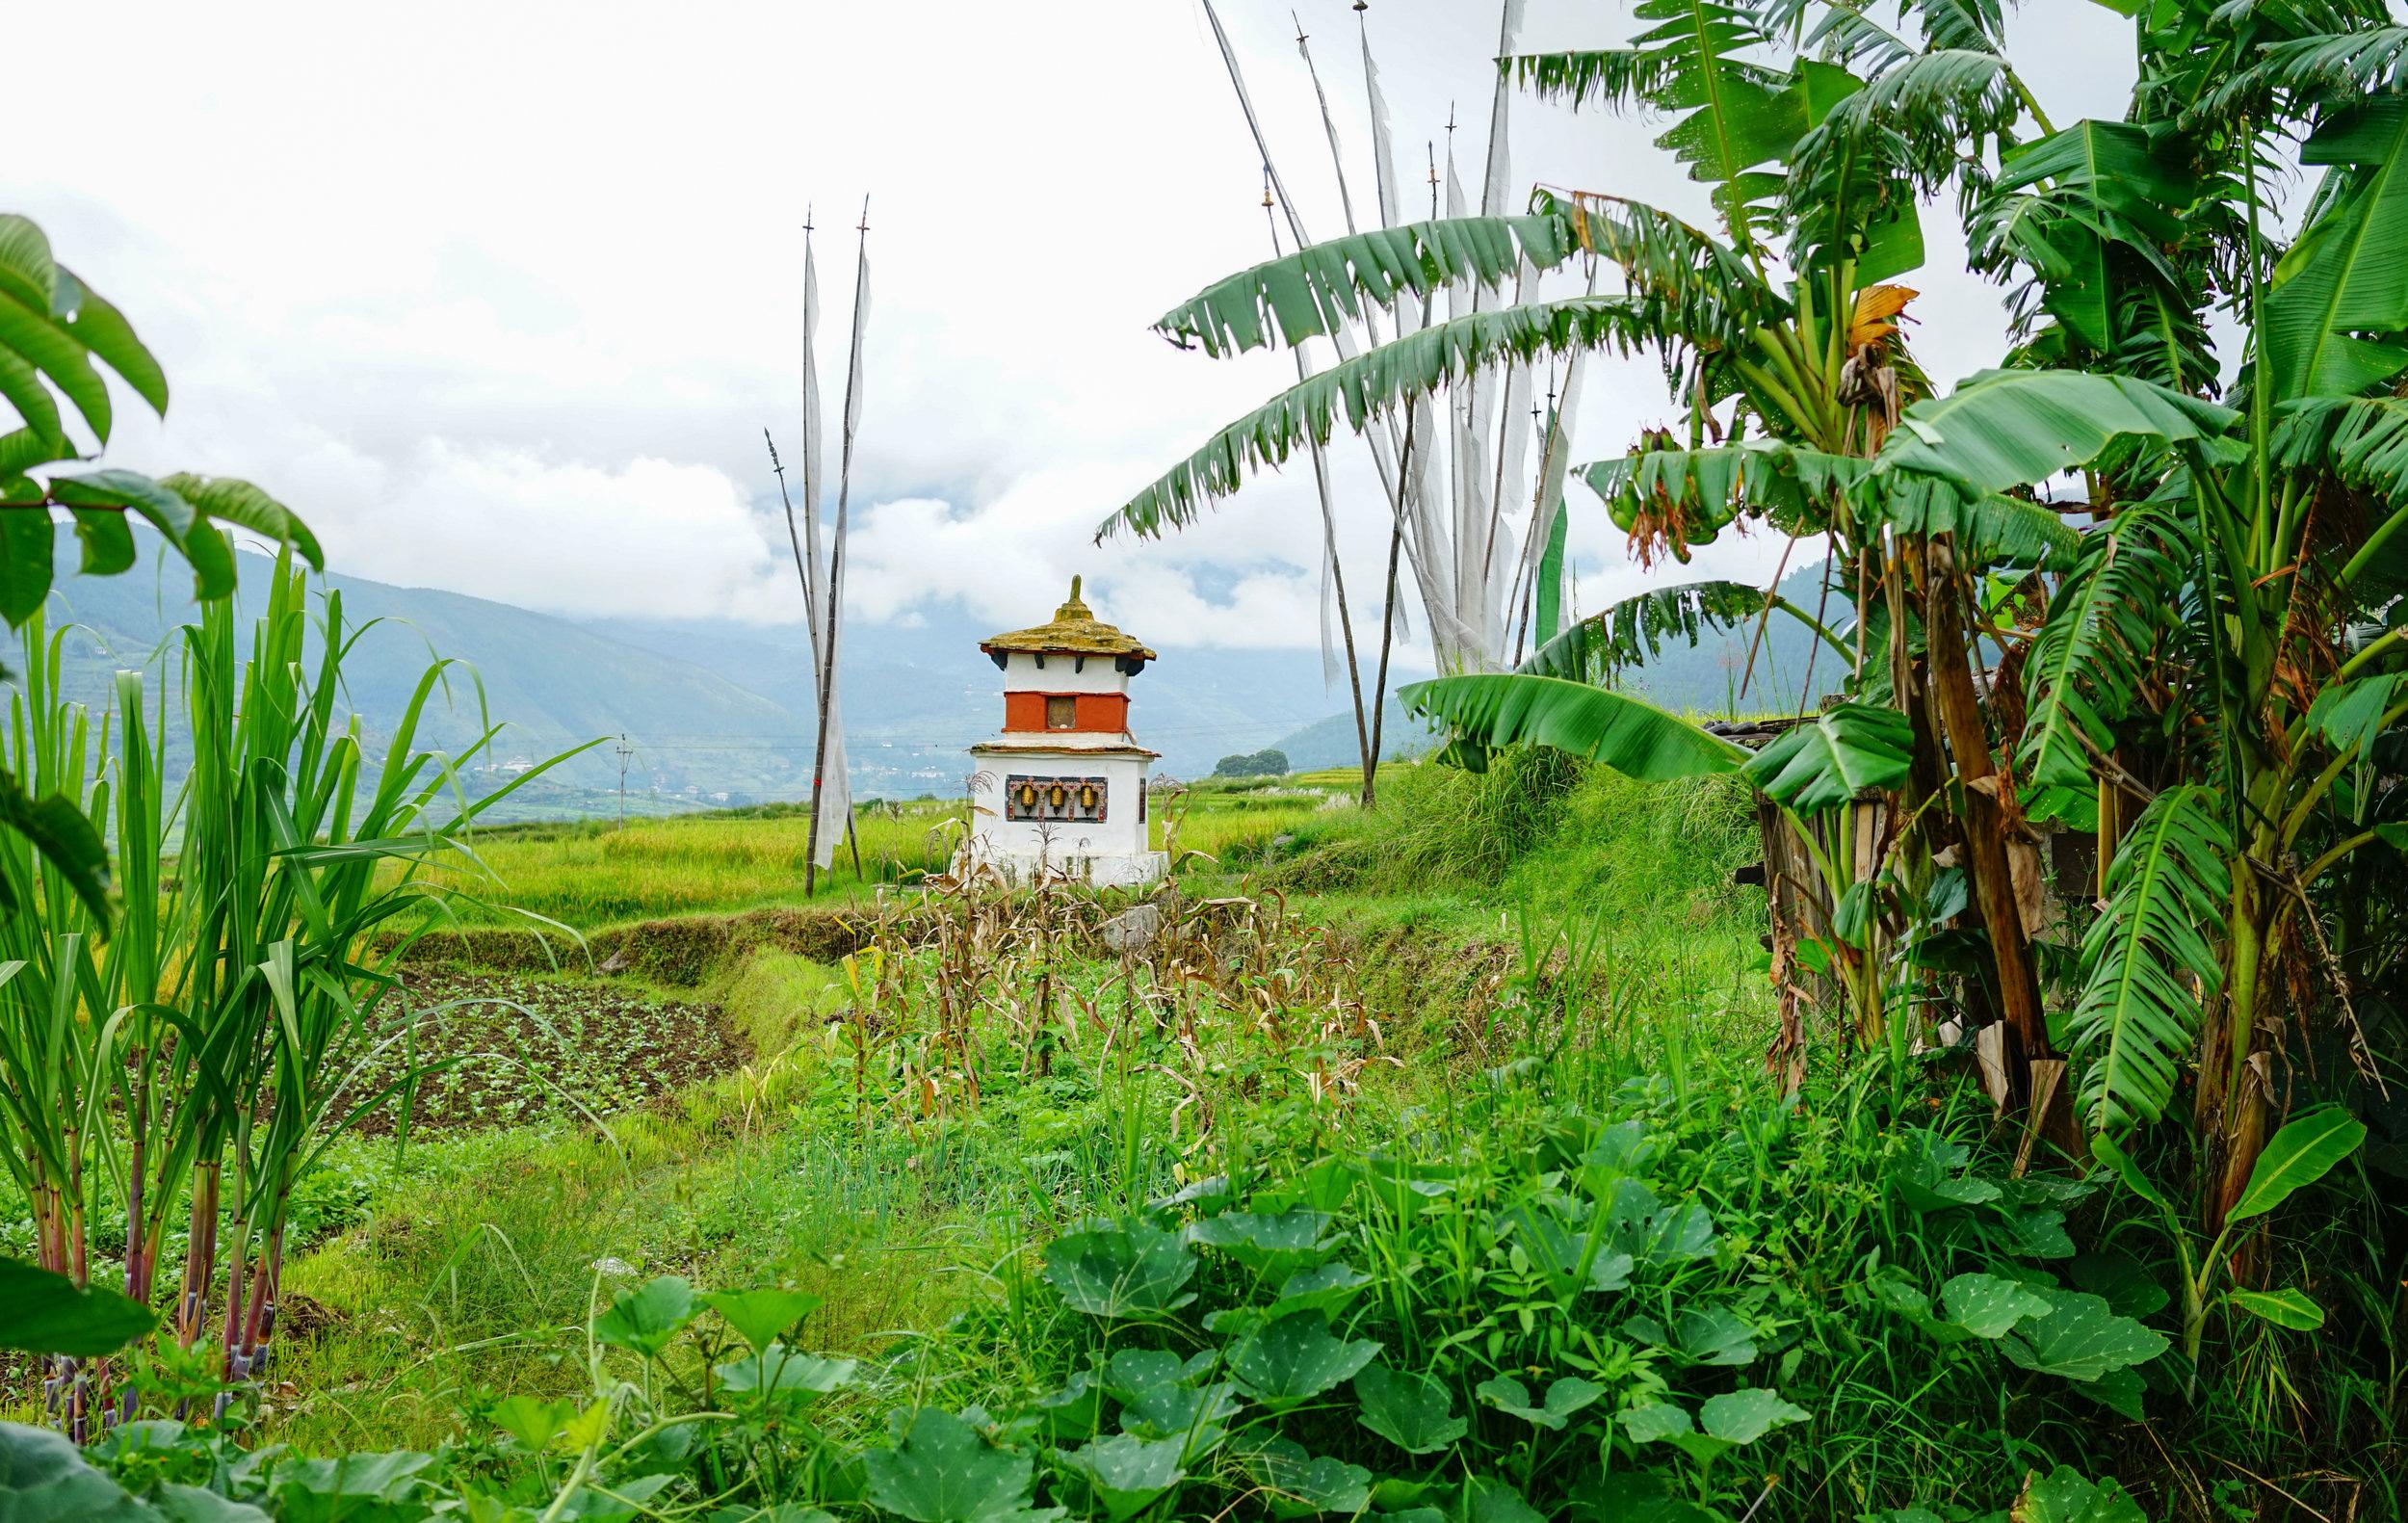 bhutan_bigstock-Terraced-Farmland-In-Bhutan-172703807.jpg